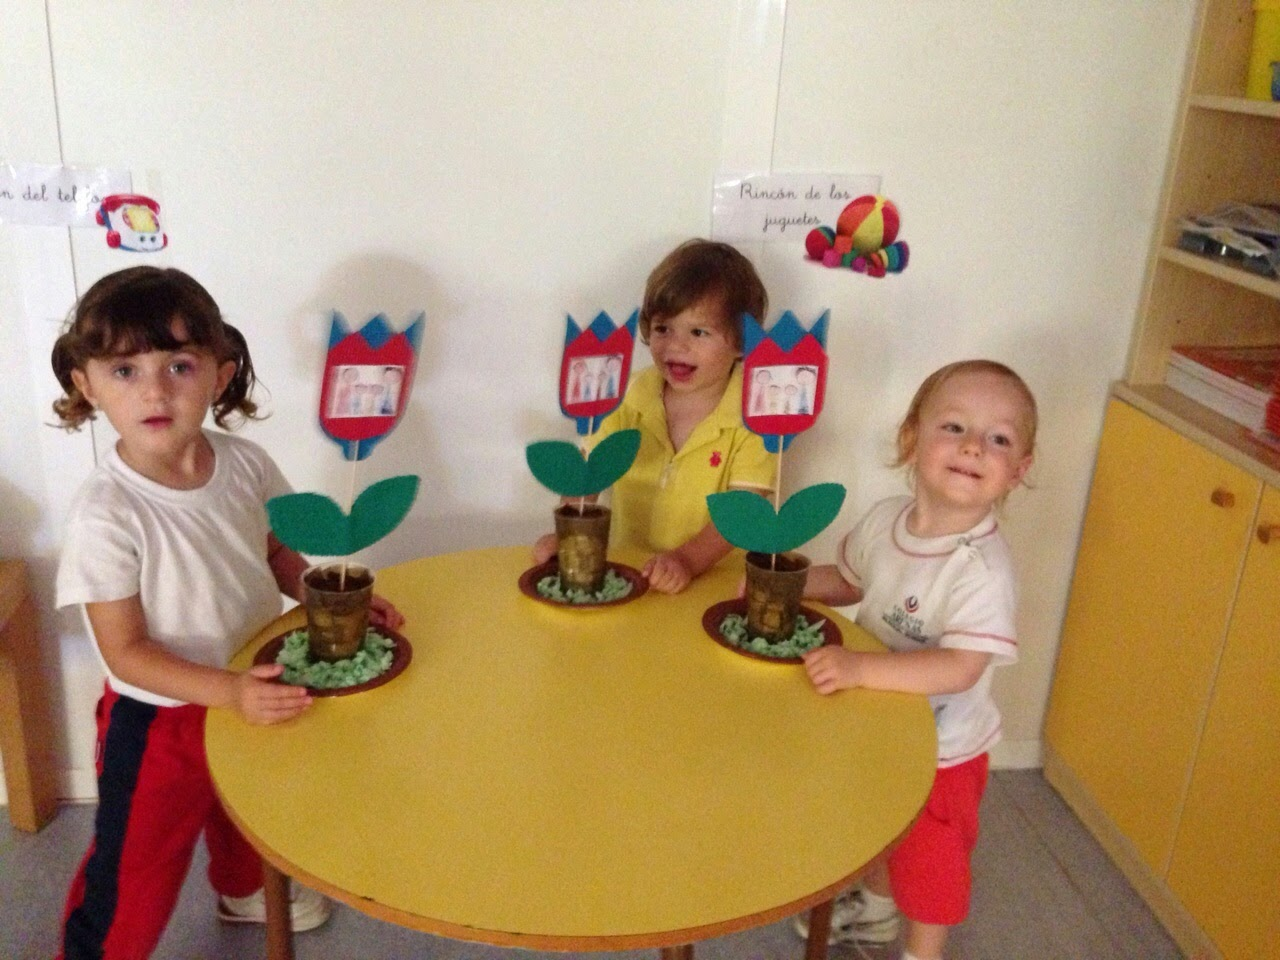 Trazos de colores feliz d a de la familia 2015 - Manualidades en familia ...